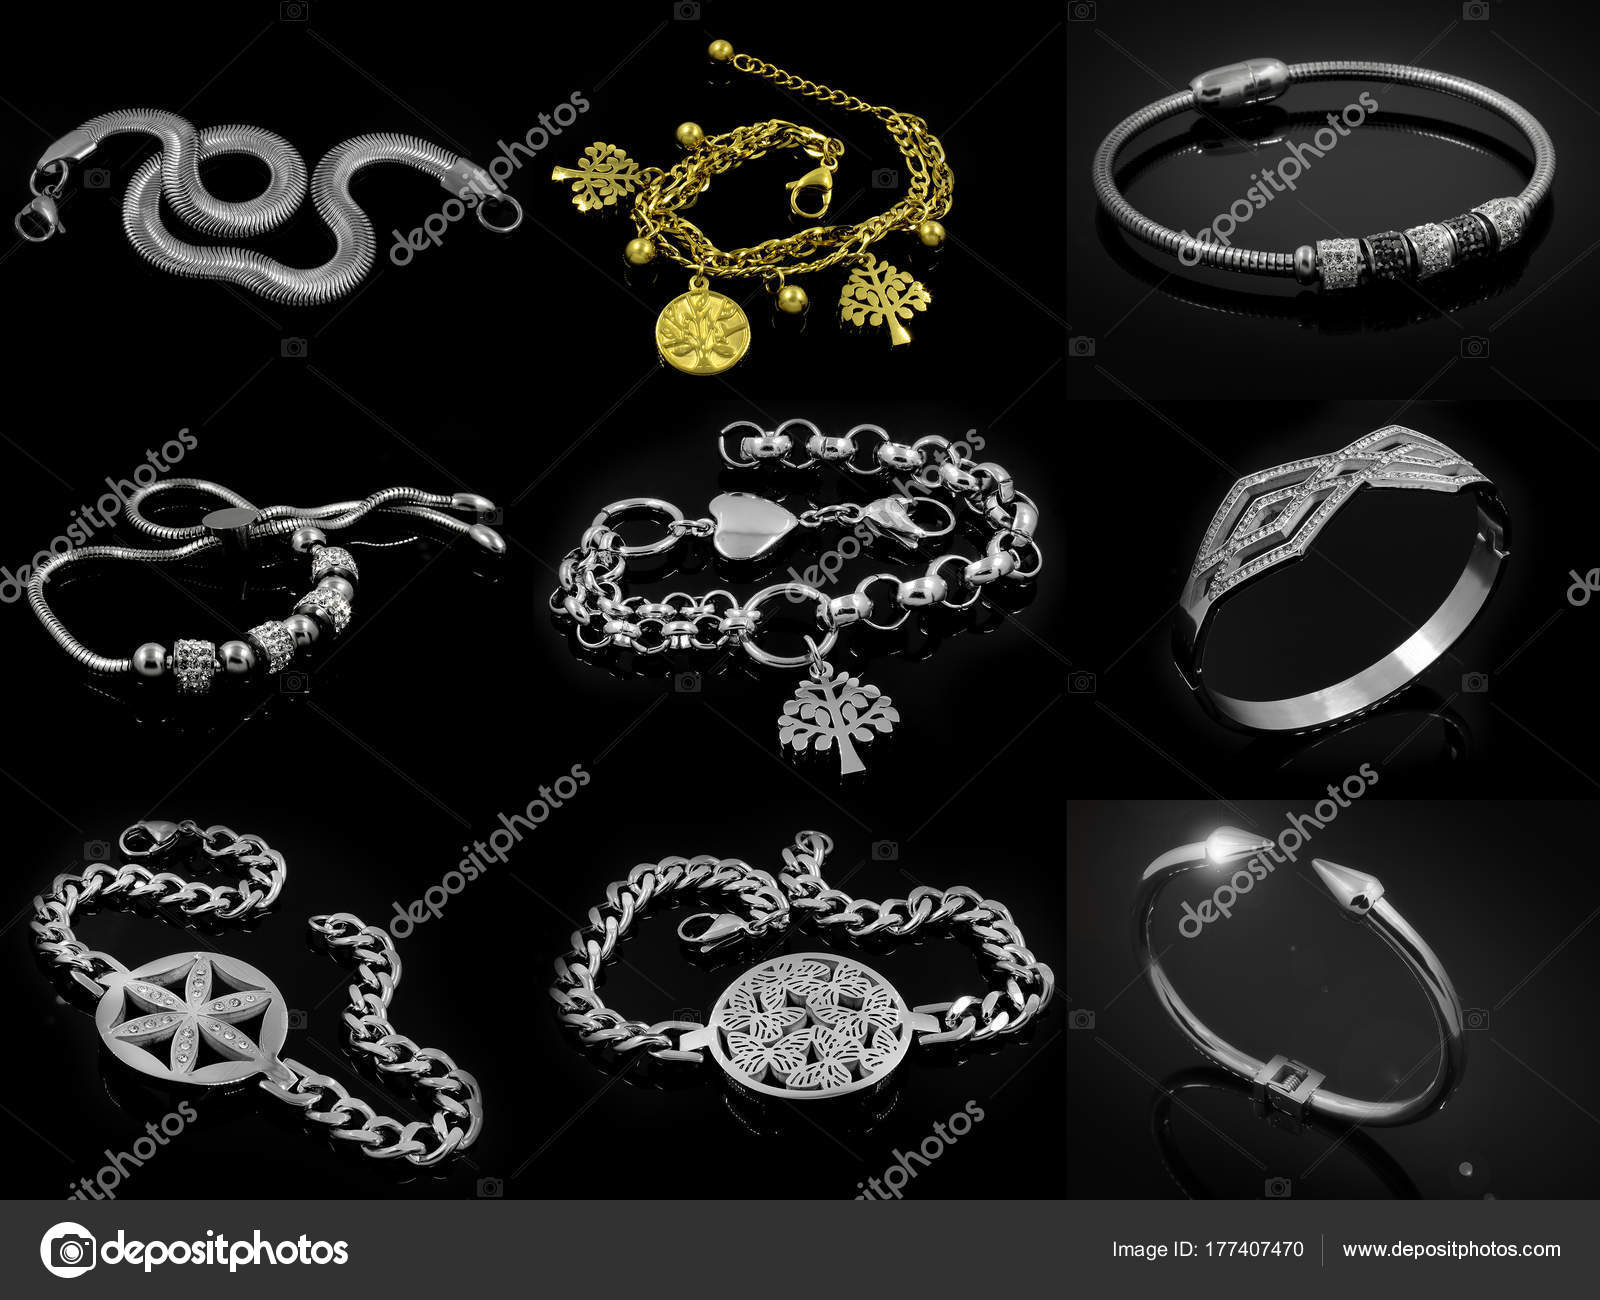 0533cd87b4 Ένα σετ βραχιόλια - Κοσμήματα - φωτογραφίες — Φωτογραφία Αρχείου ...